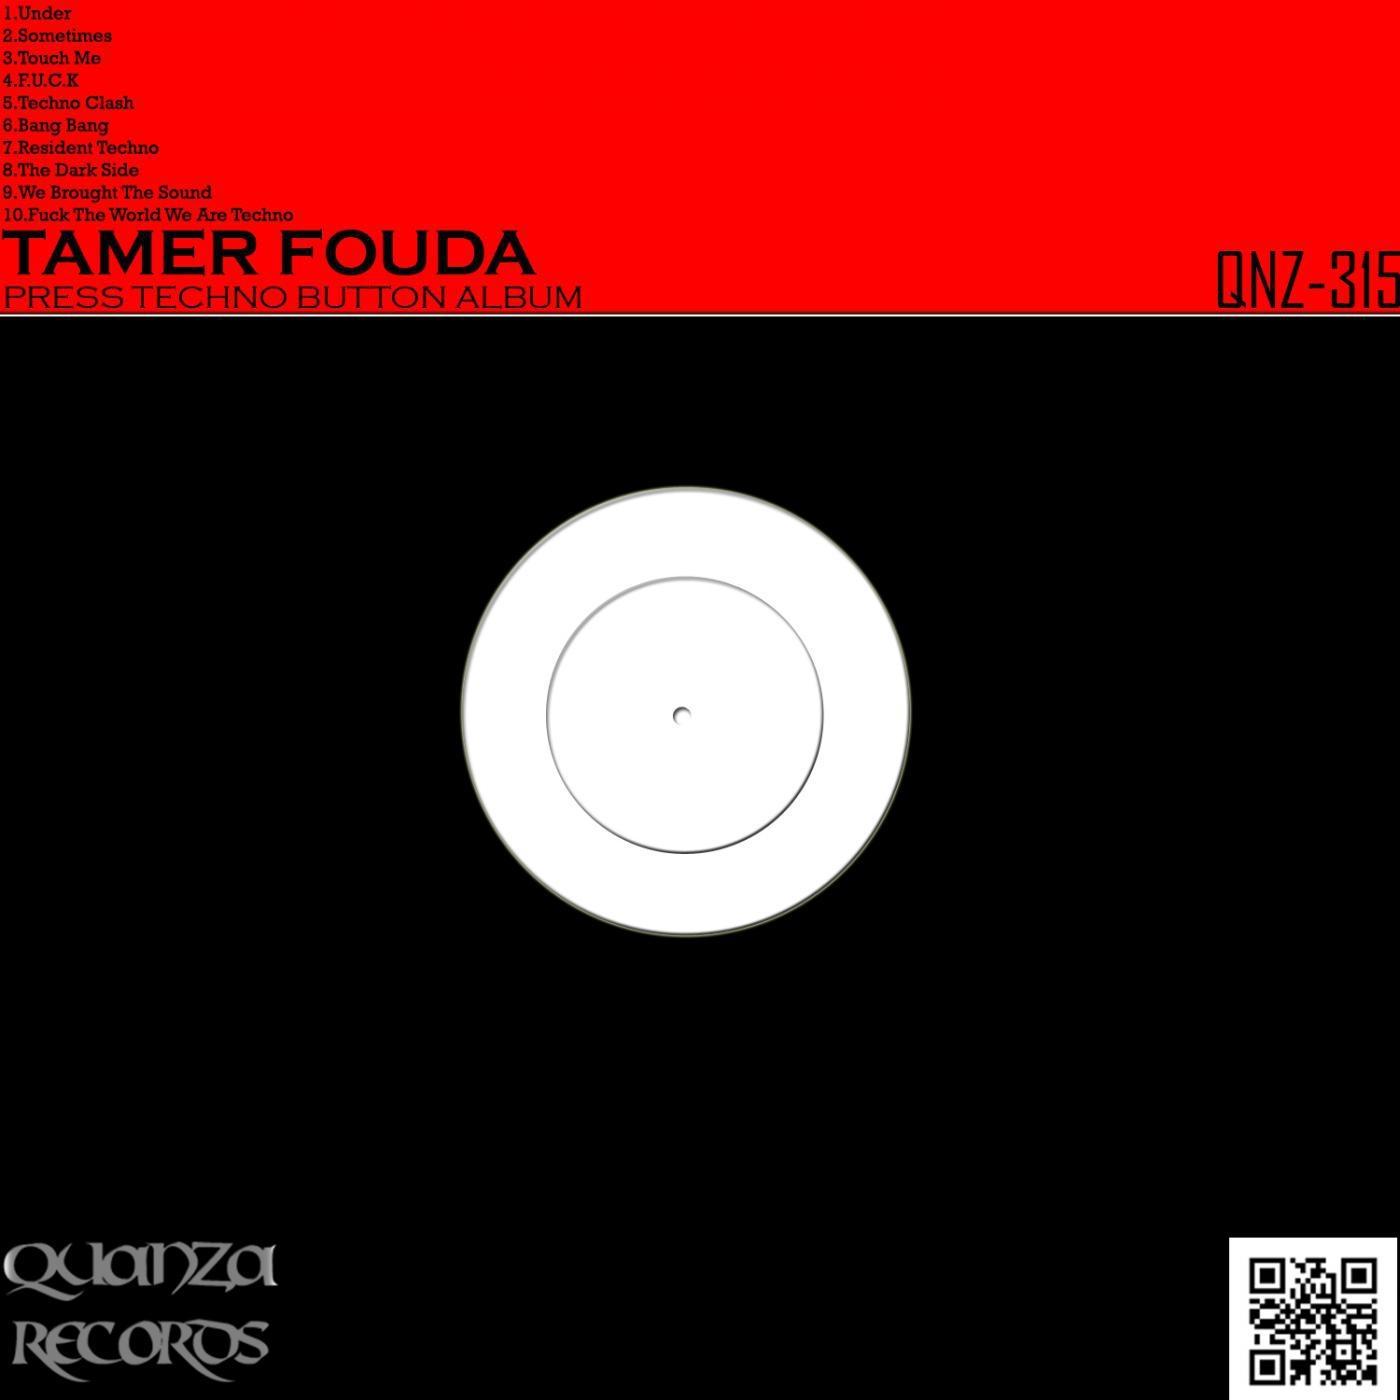 Tamer Fouda - F.u.c.k (Original Mix)